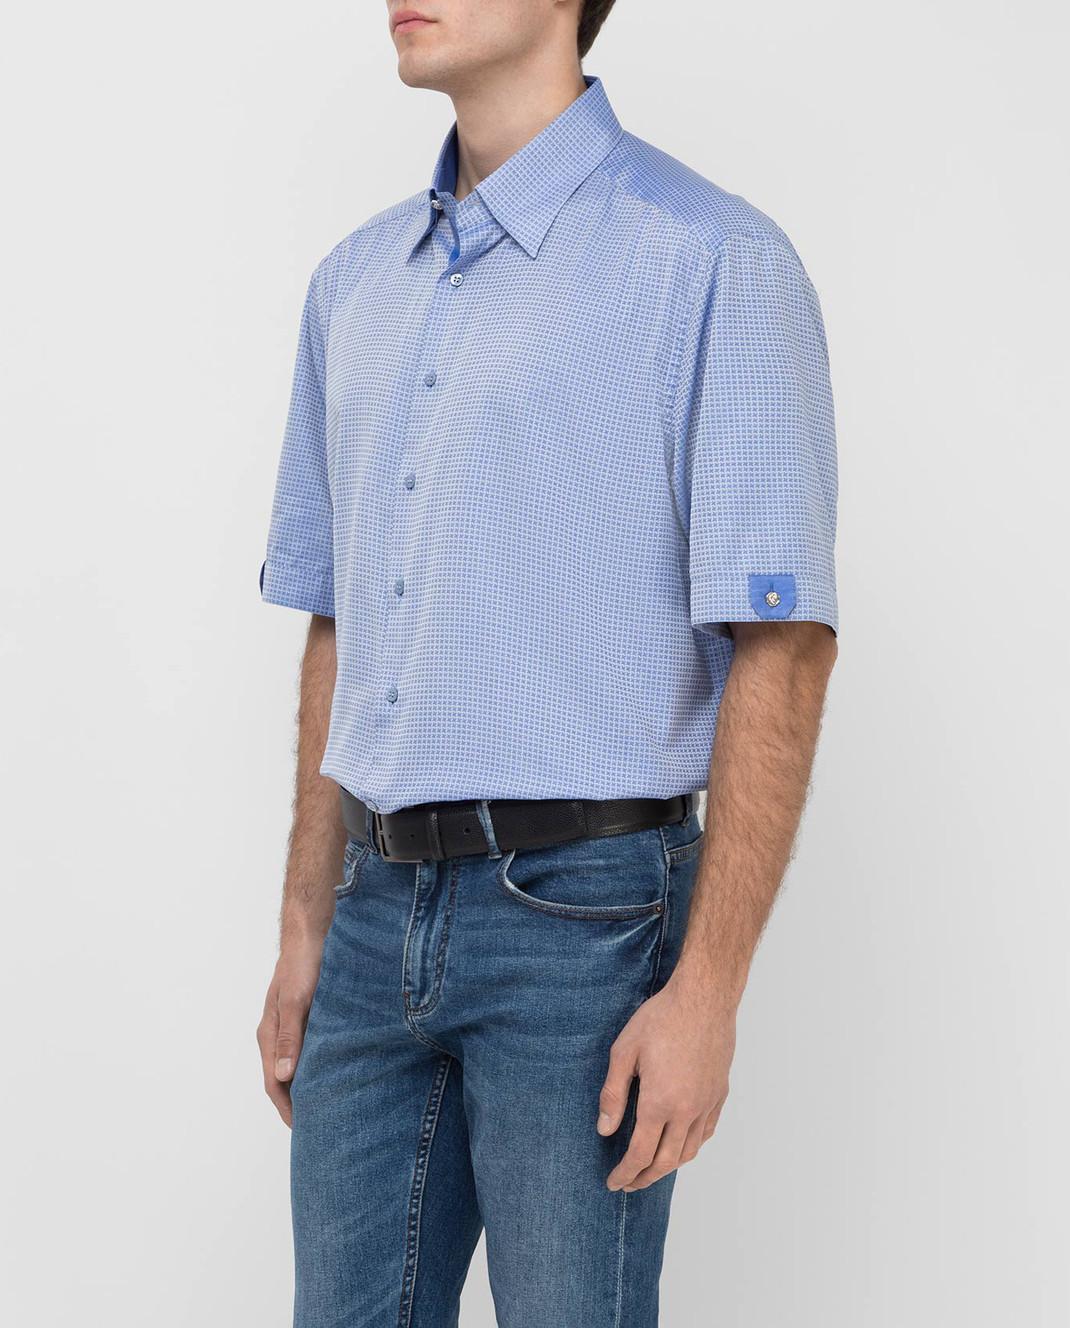 Stefano Ricci Голубая рубашка MC0020801553 изображение 3